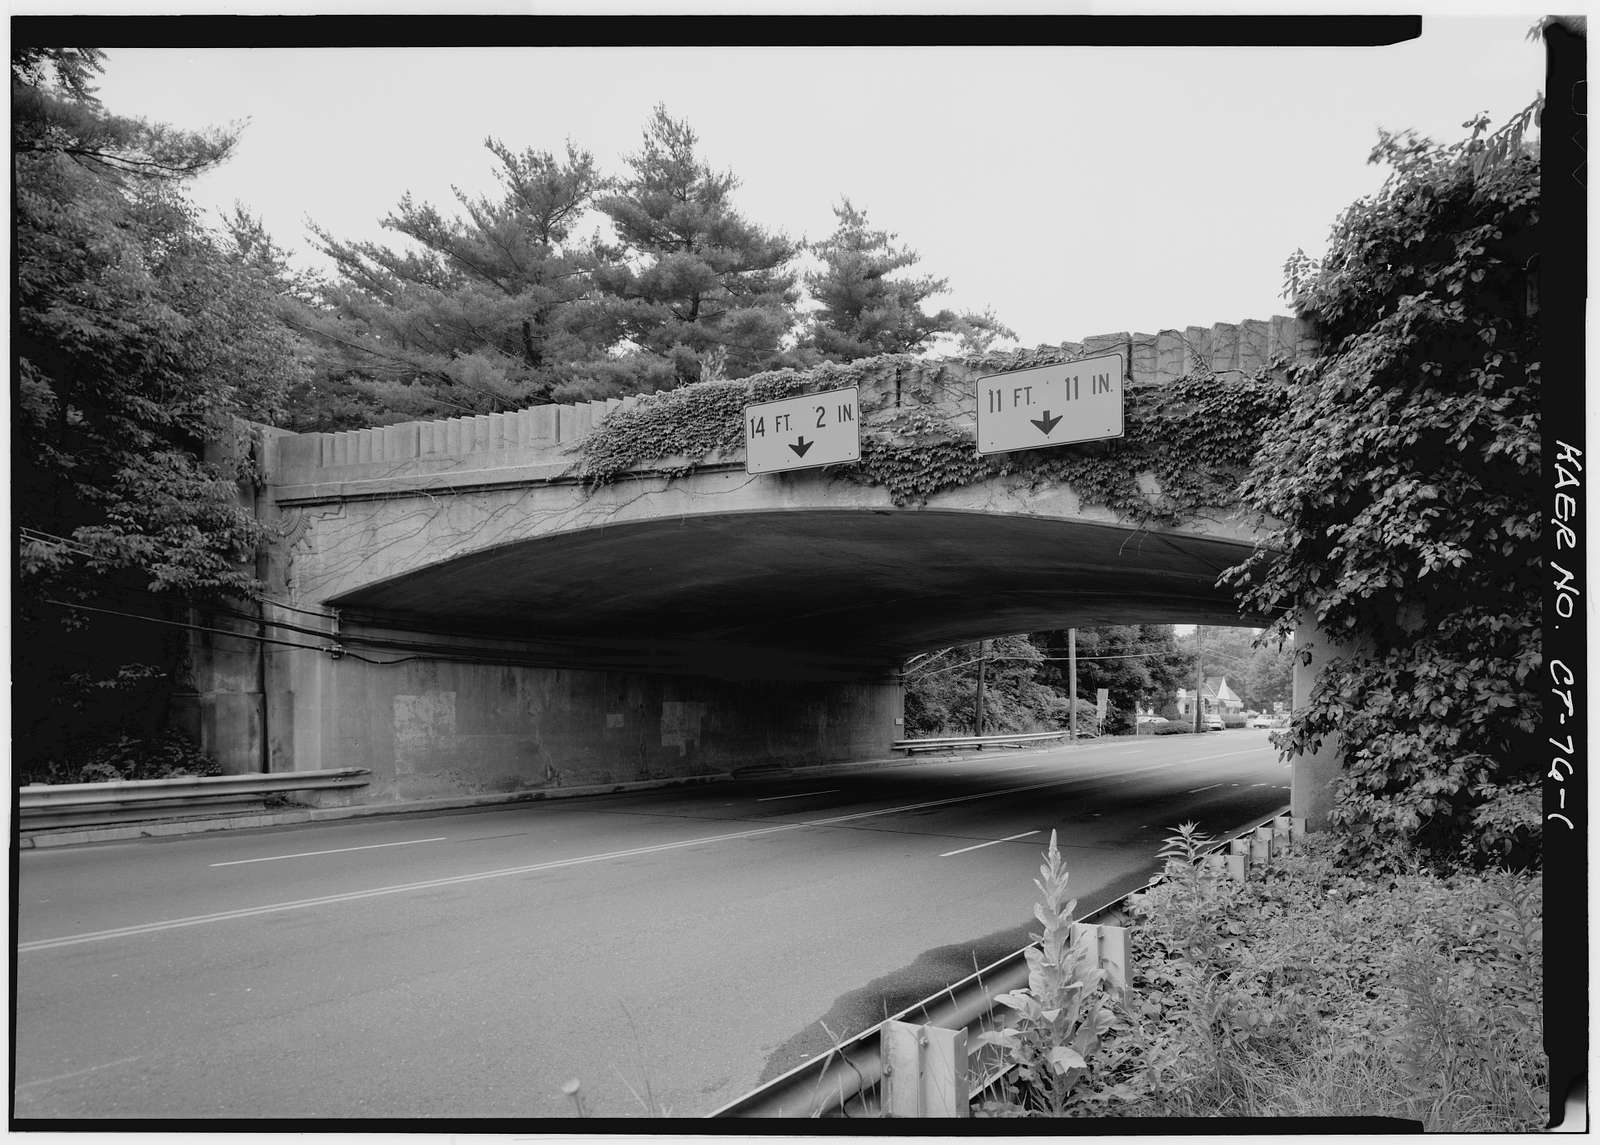 Merritt Parkway, Long Ridge Road/Route 104 Bridge, Spanning Long Ridge Road/Route 104, Stamford, Fairfield County, CT